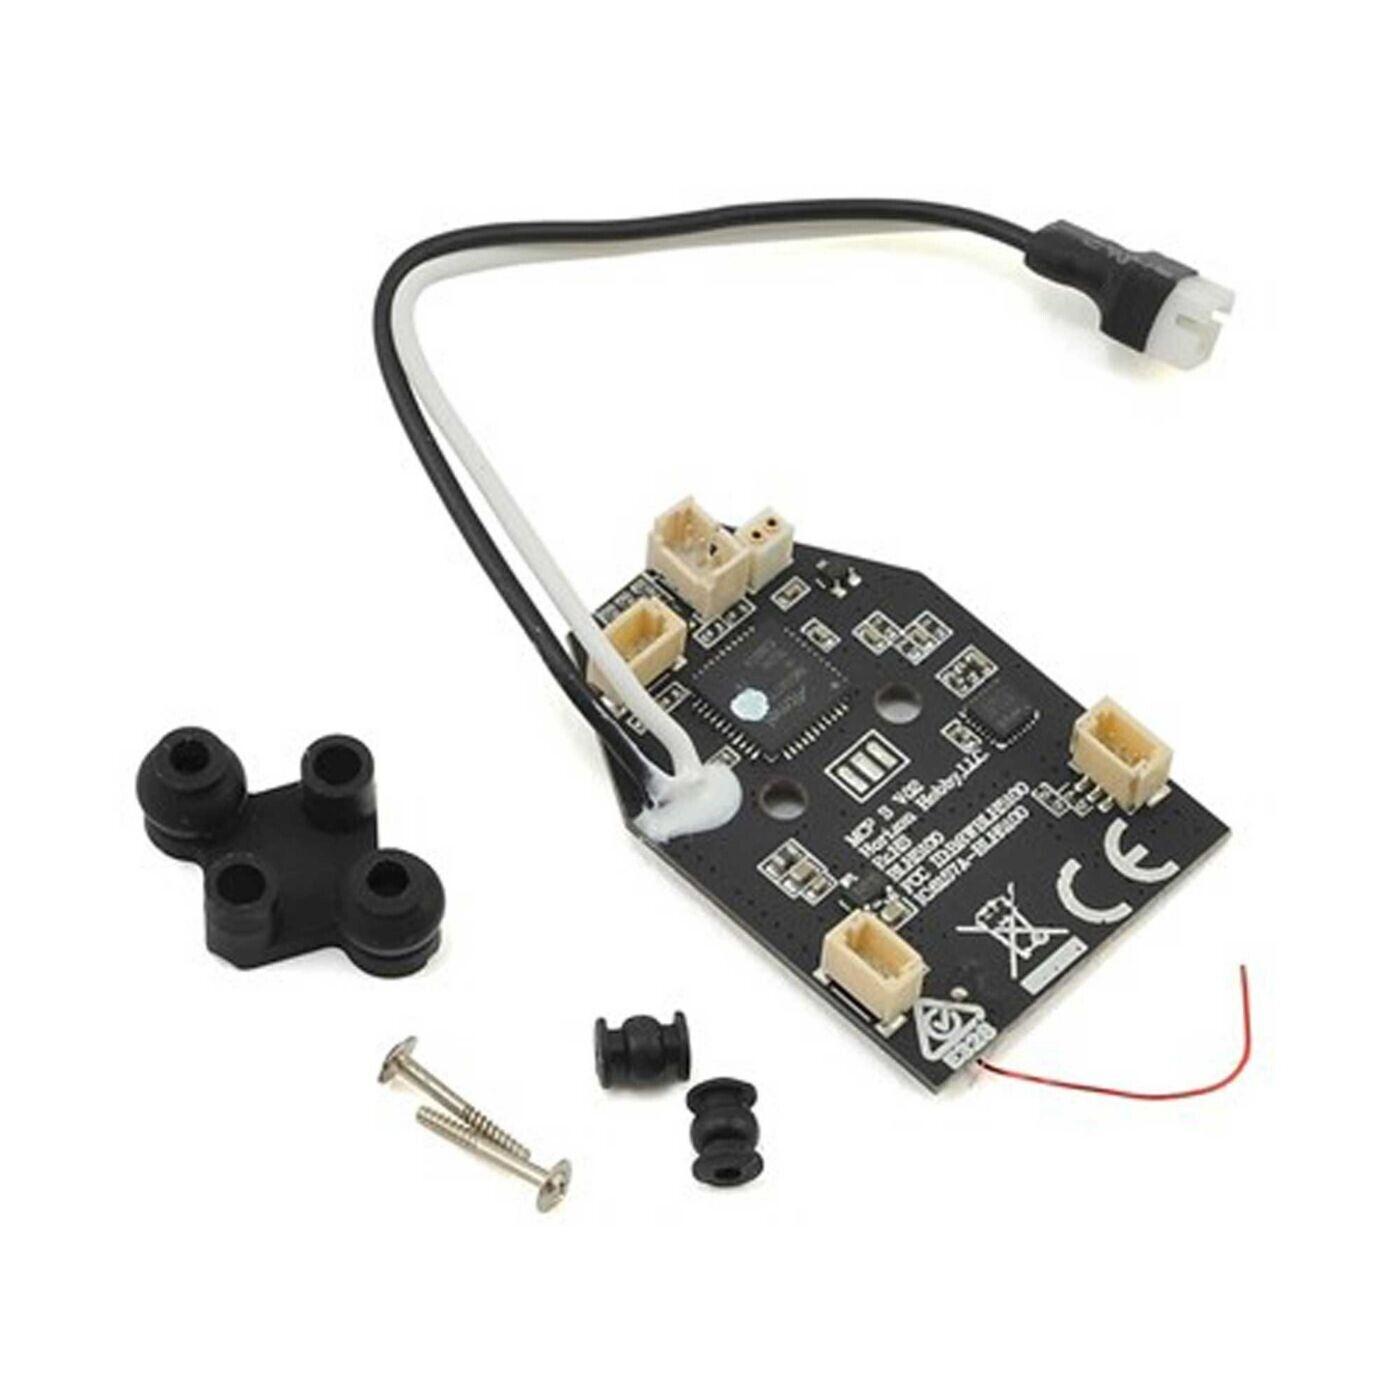 buona reputazione Unità Flybarless 3n1 CTRL, RX ESC ESC ESC Gyros  mCP S Z-BLH5101  comprare sconti